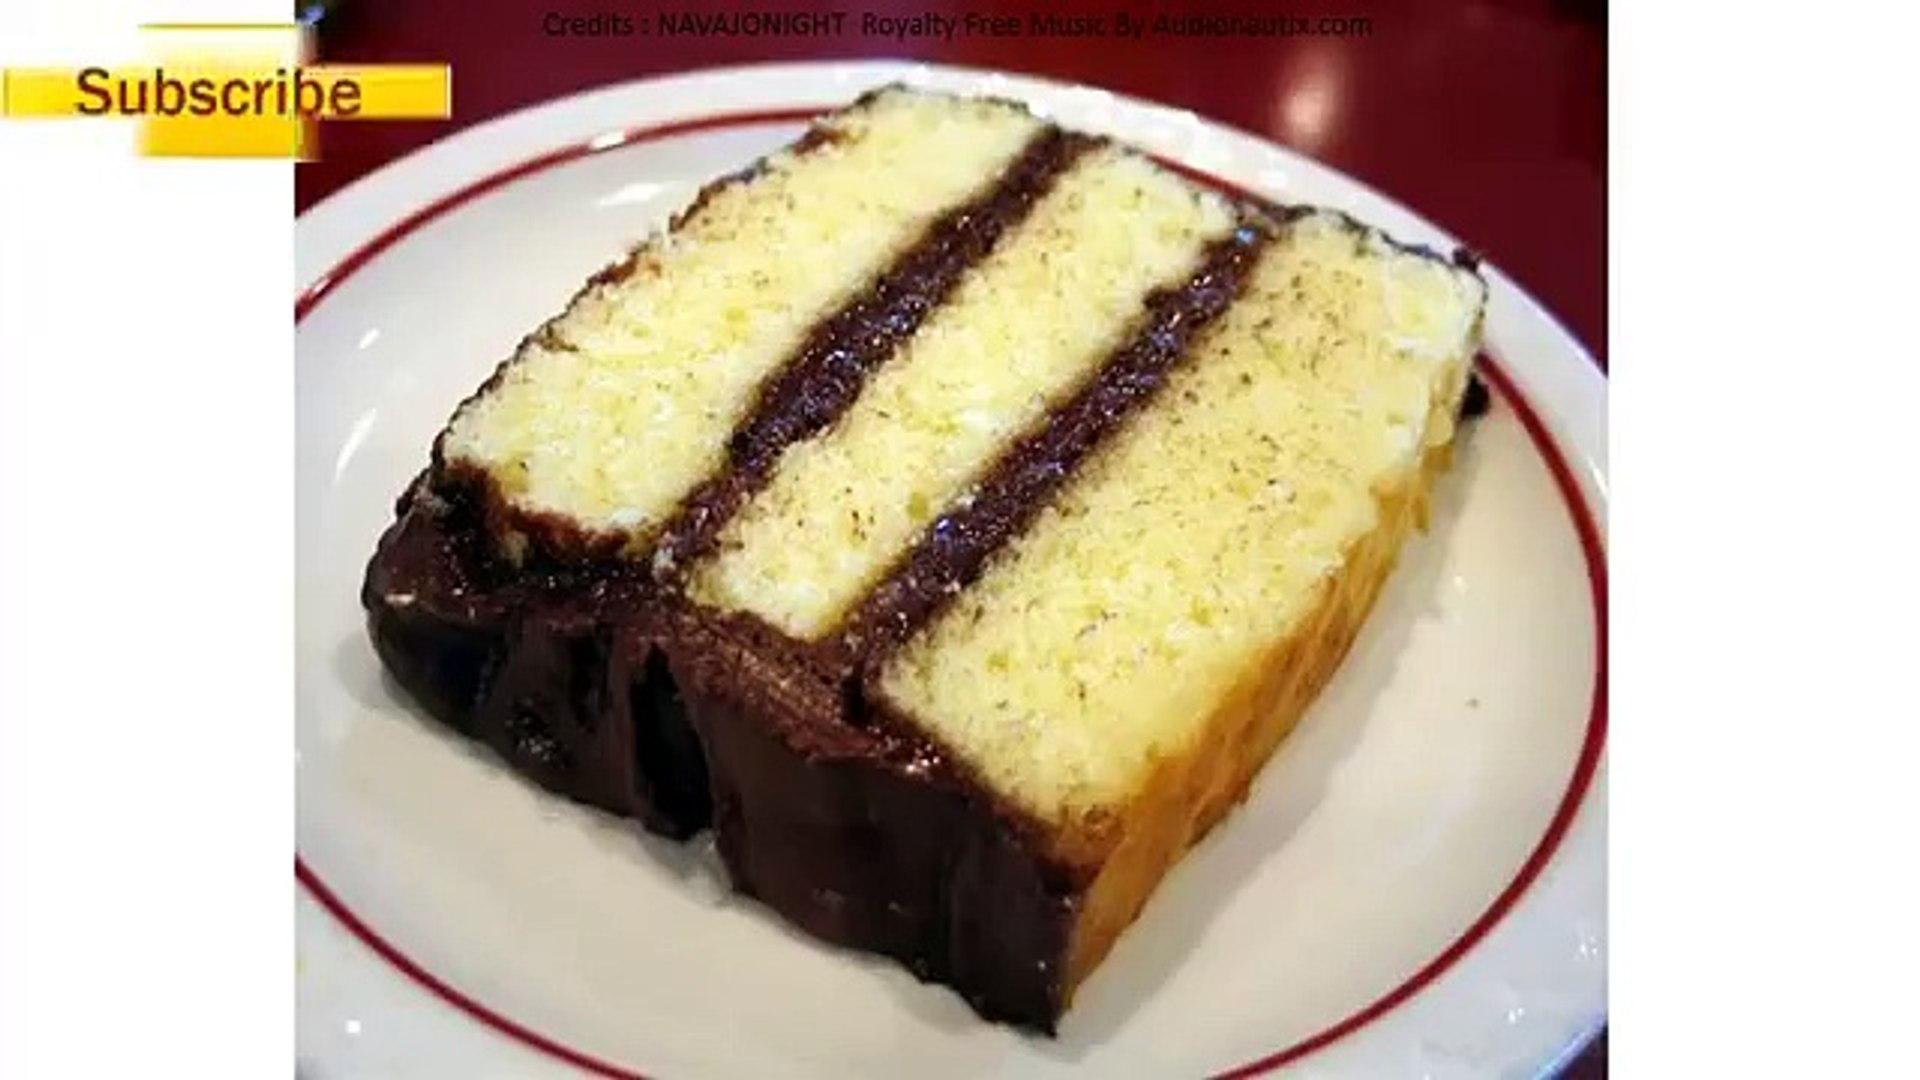 Favourite Cakes - Moist Chocolate Cake